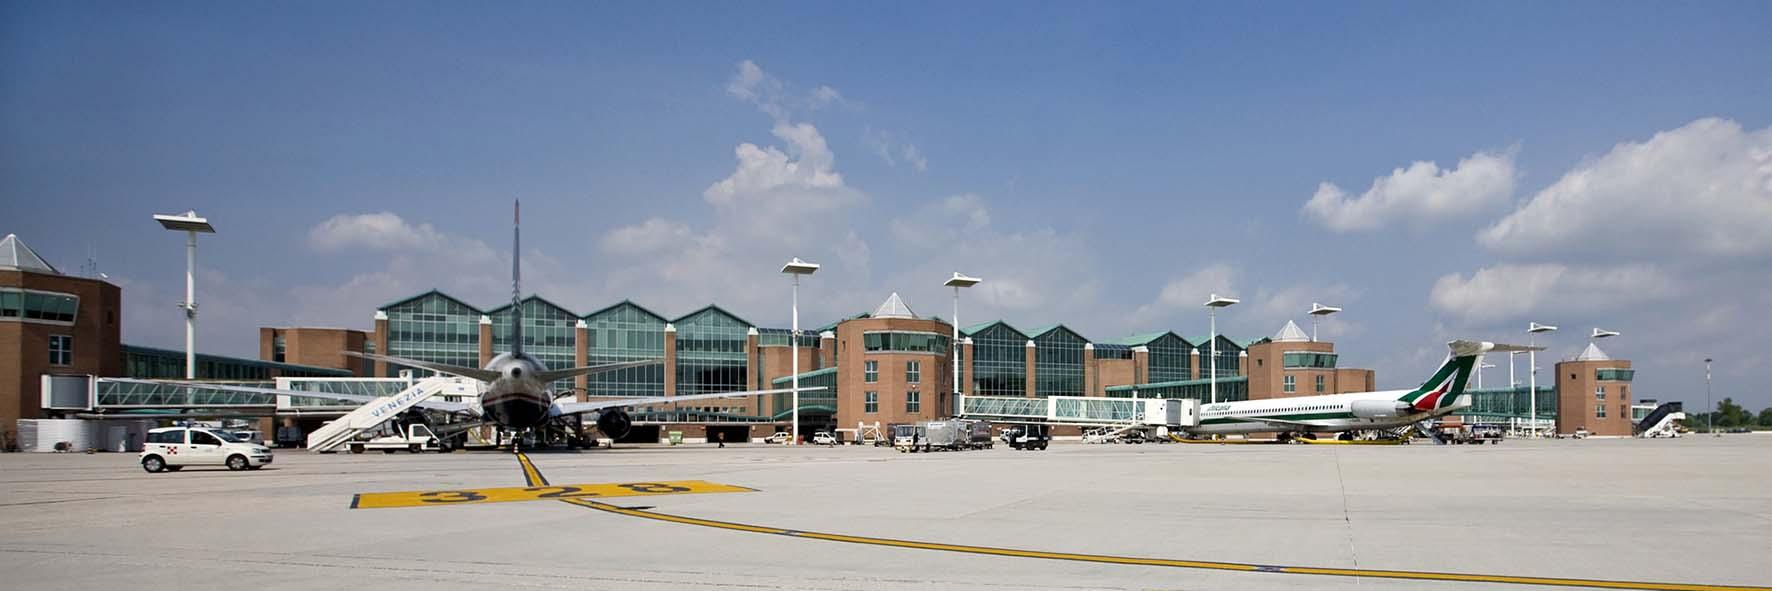 aereoporto marco polo